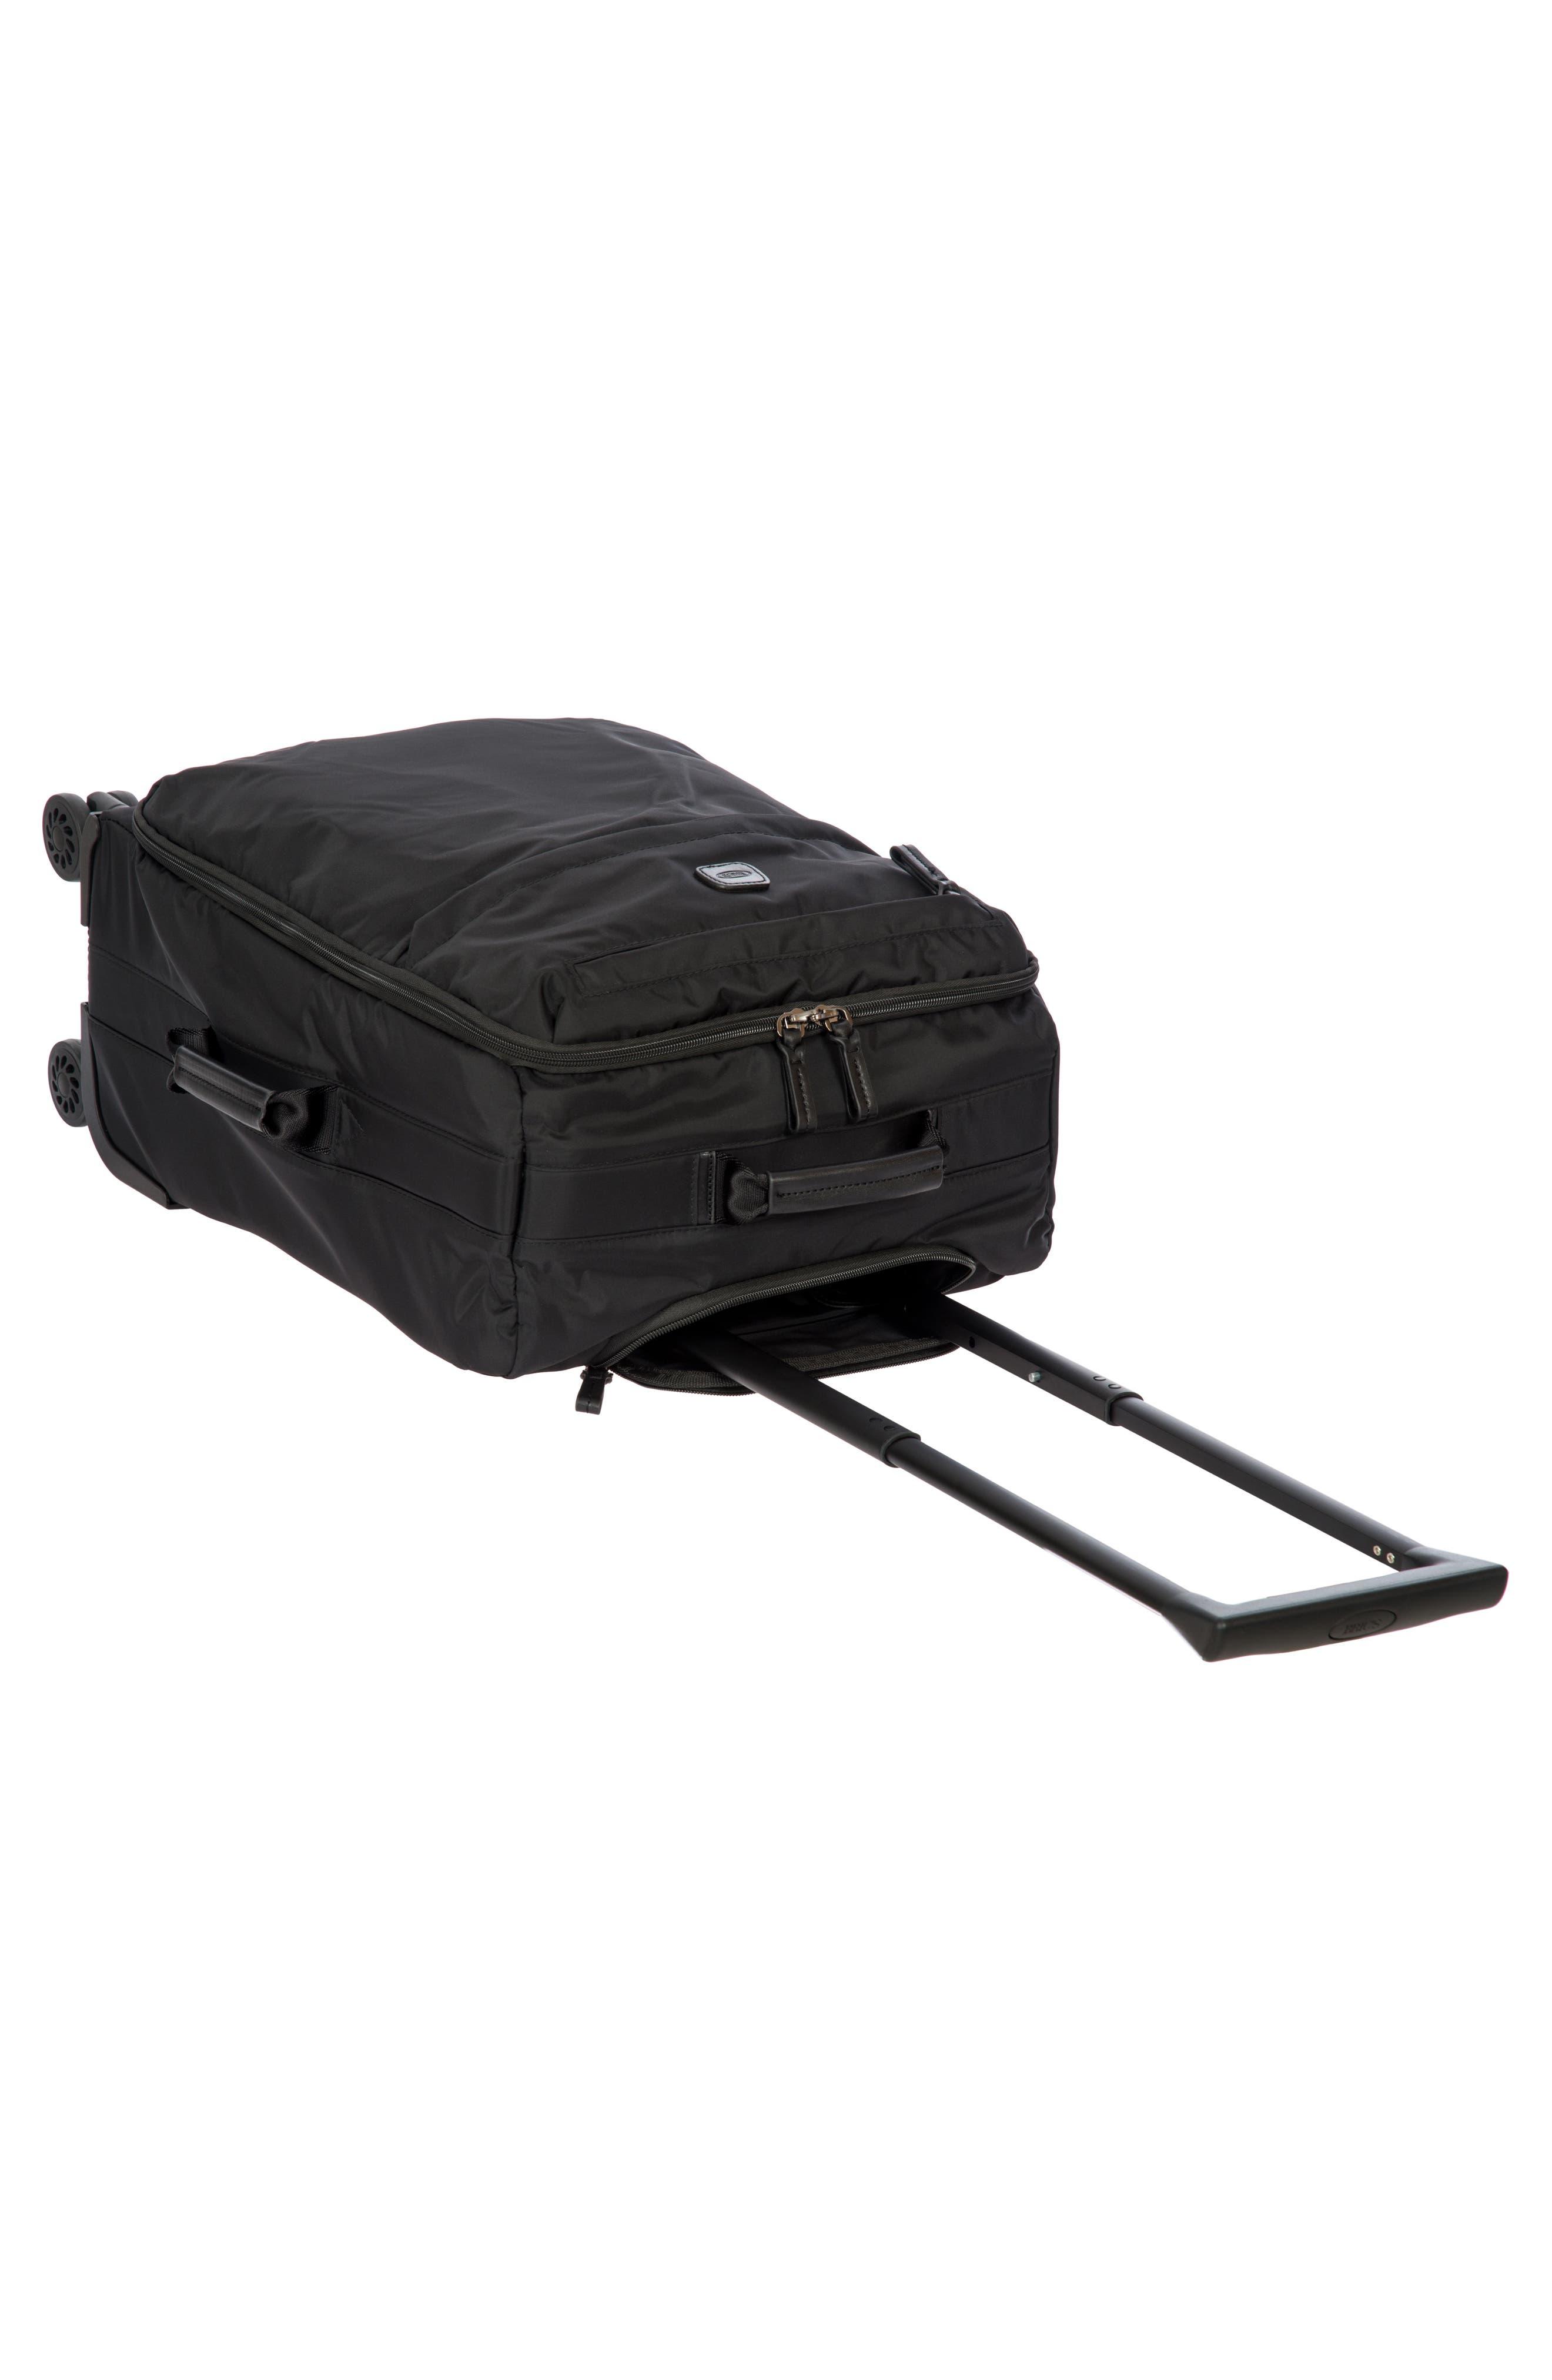 X-Bag 21-Inch Spinner Carry-On,                             Alternate thumbnail 4, color,                             Black/ Black